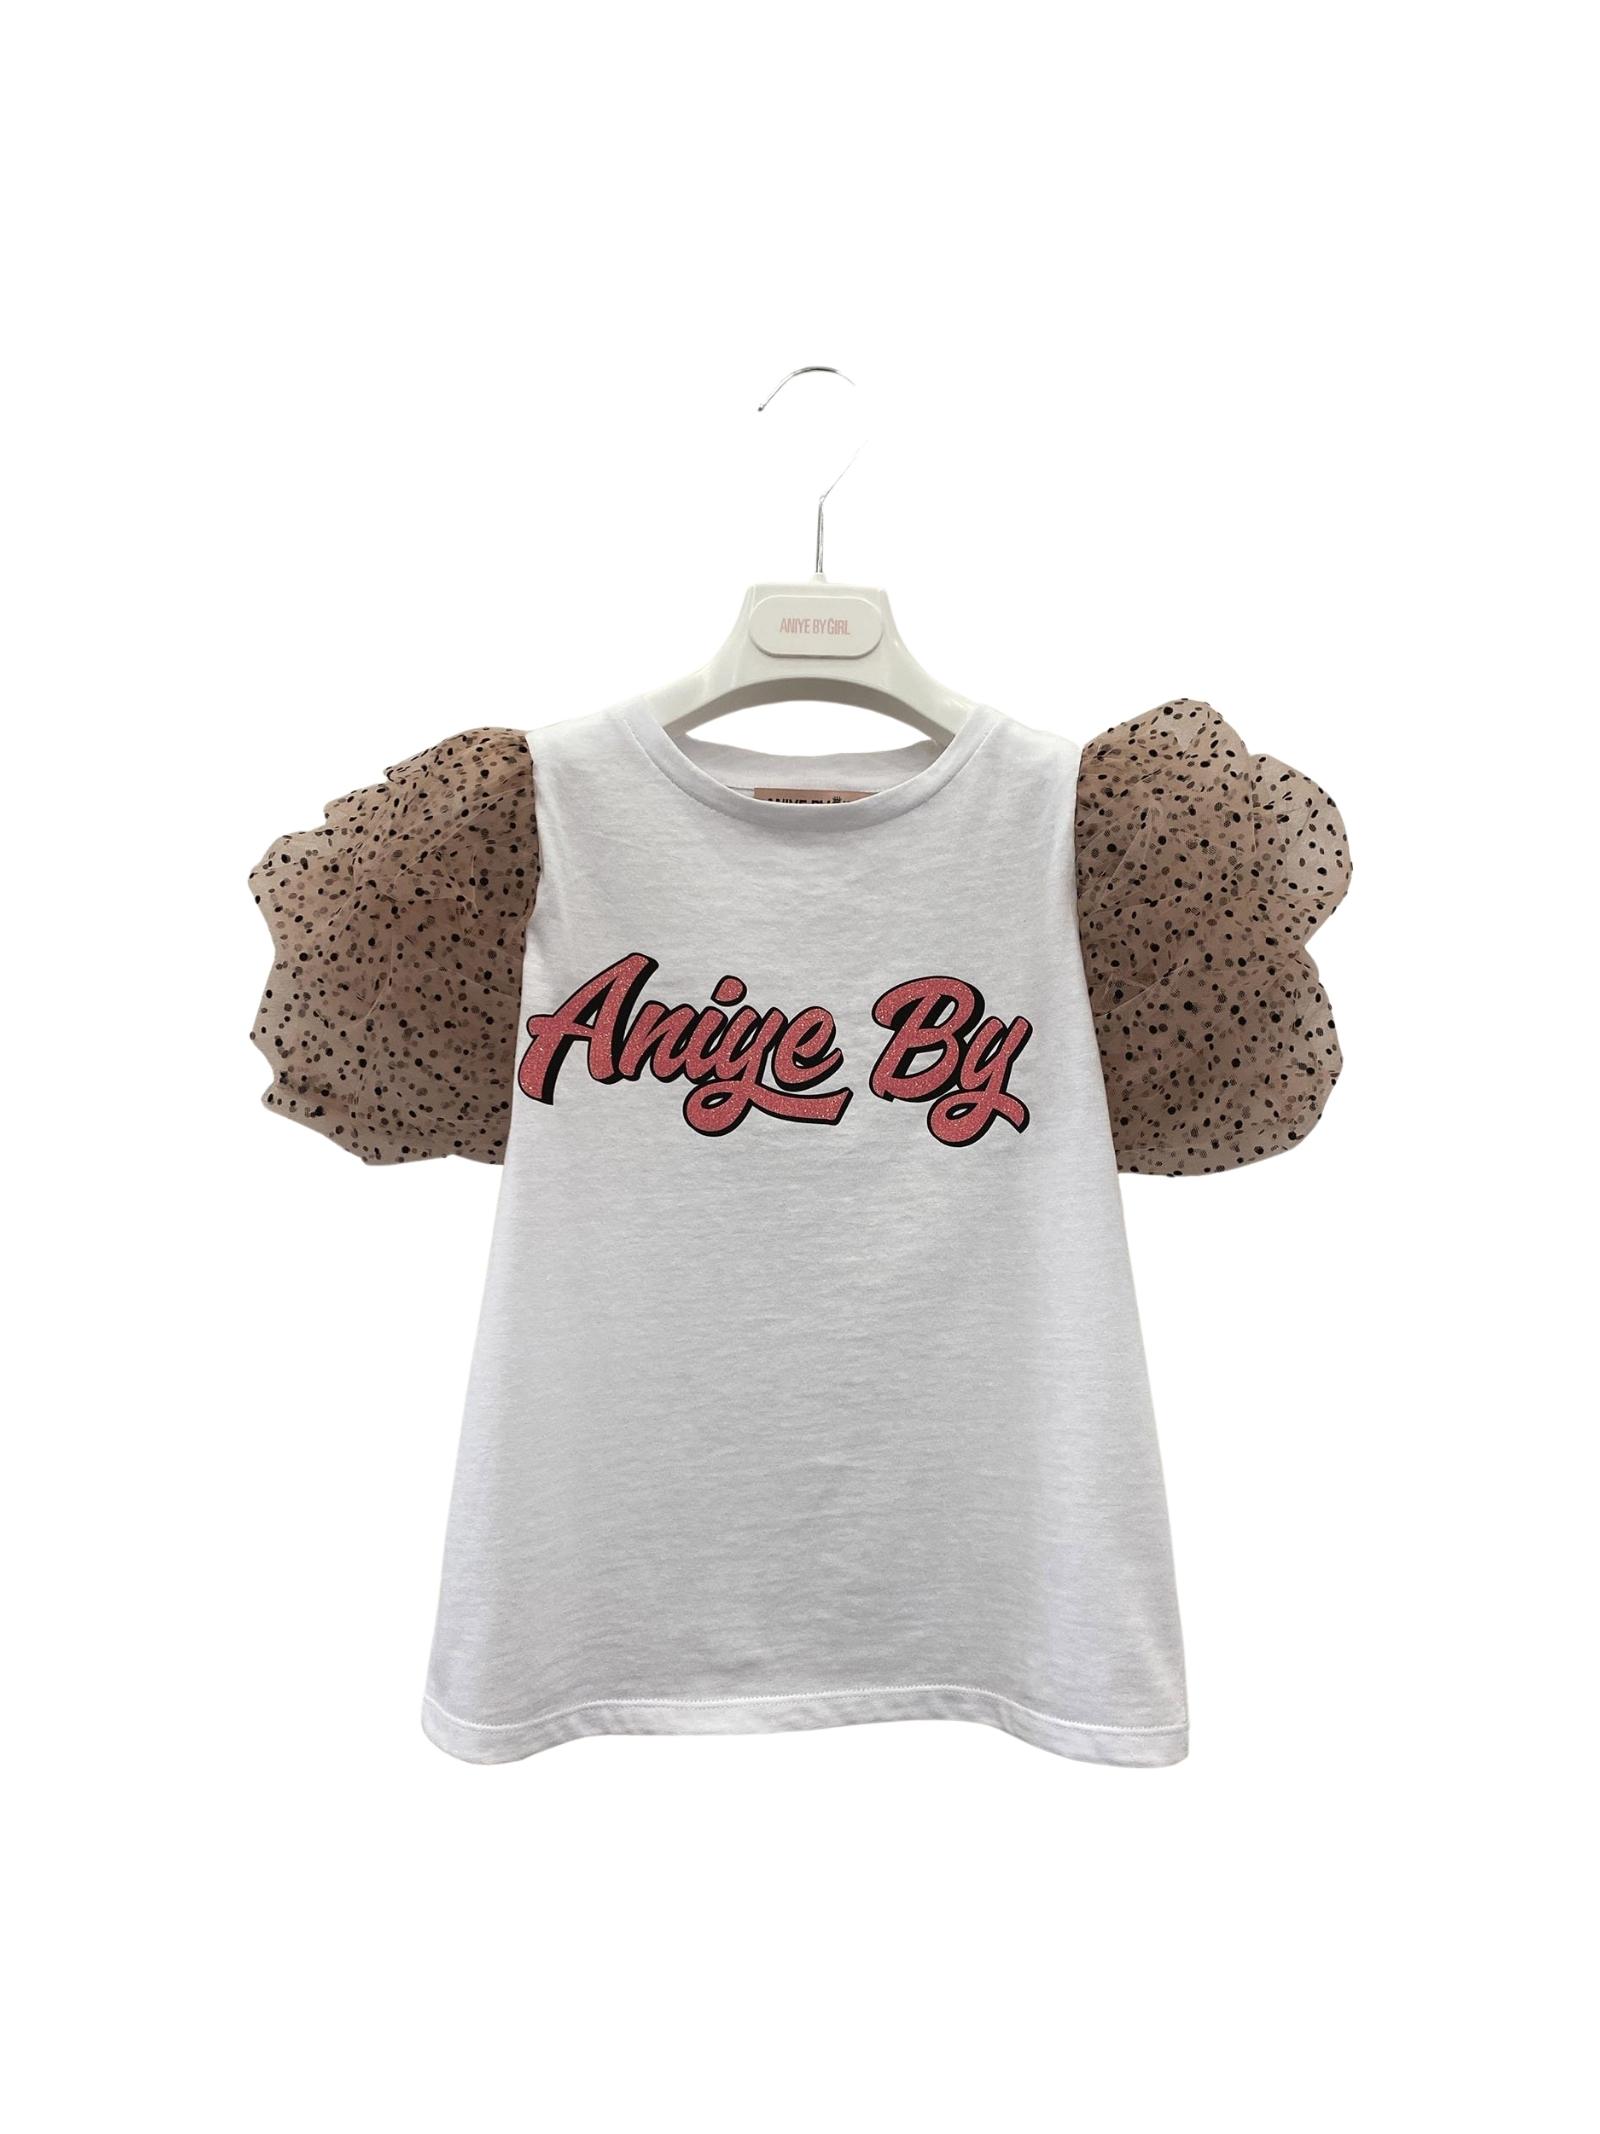 T-Shirt Maty Bambina ANIYE BY GIRL | T-shirt | 11503001898